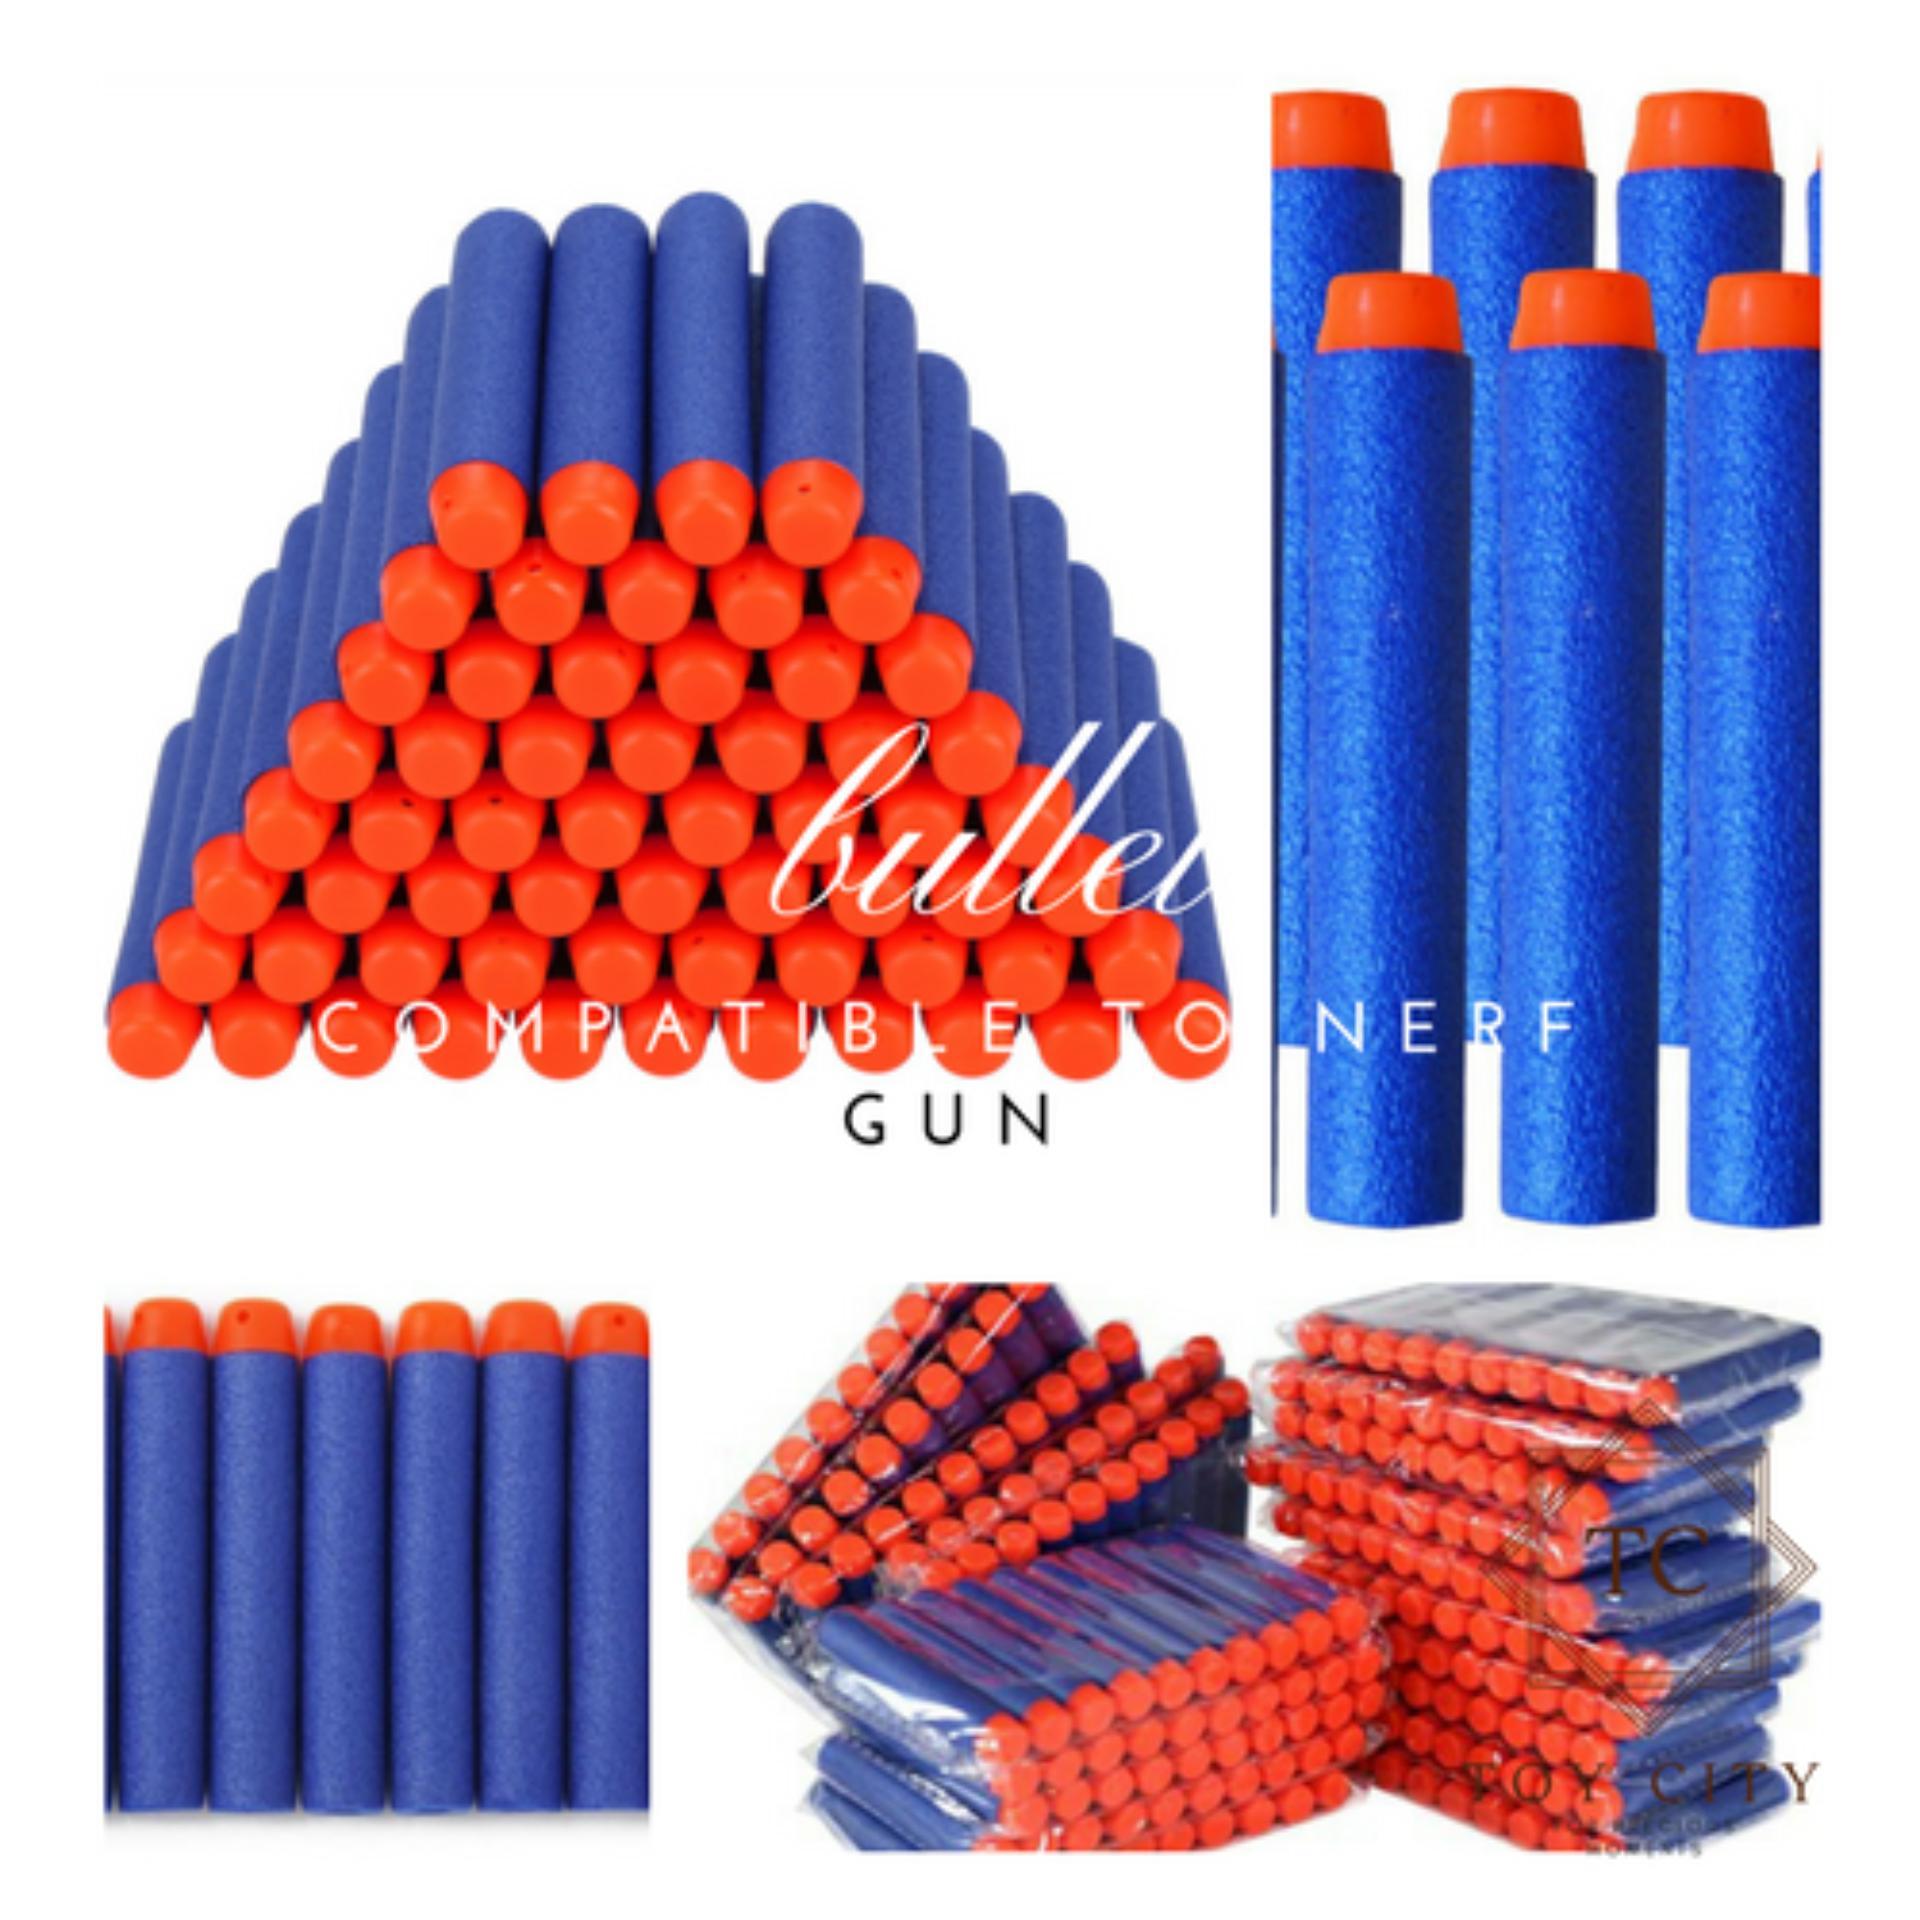 Nerf Gun 30pcs 7.2cm Refill Bullet Darts